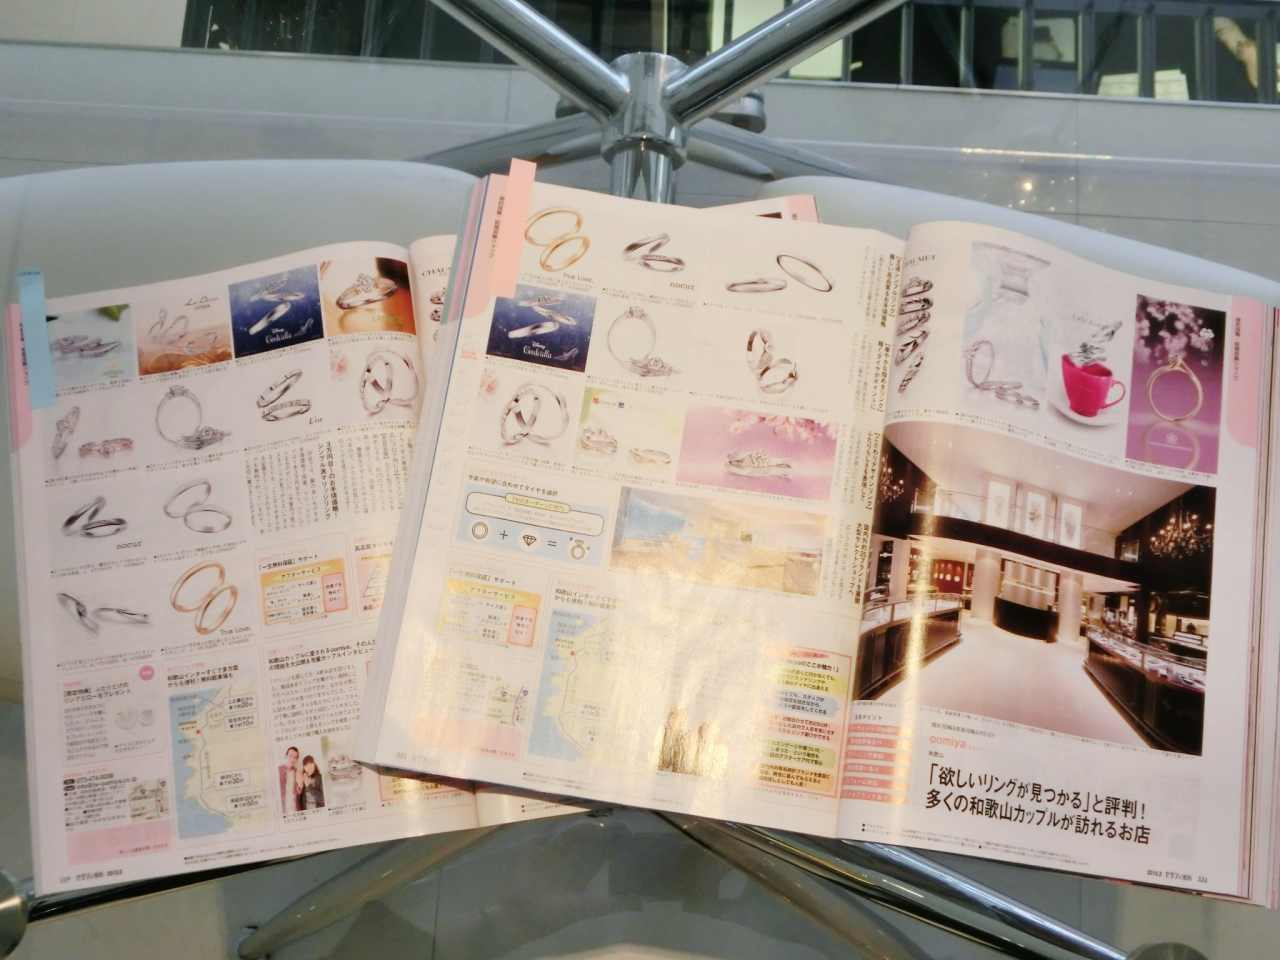 oomiya和歌山本店 ゼクシィ掲載商品は⇒ピンクの矢印をチェック☆